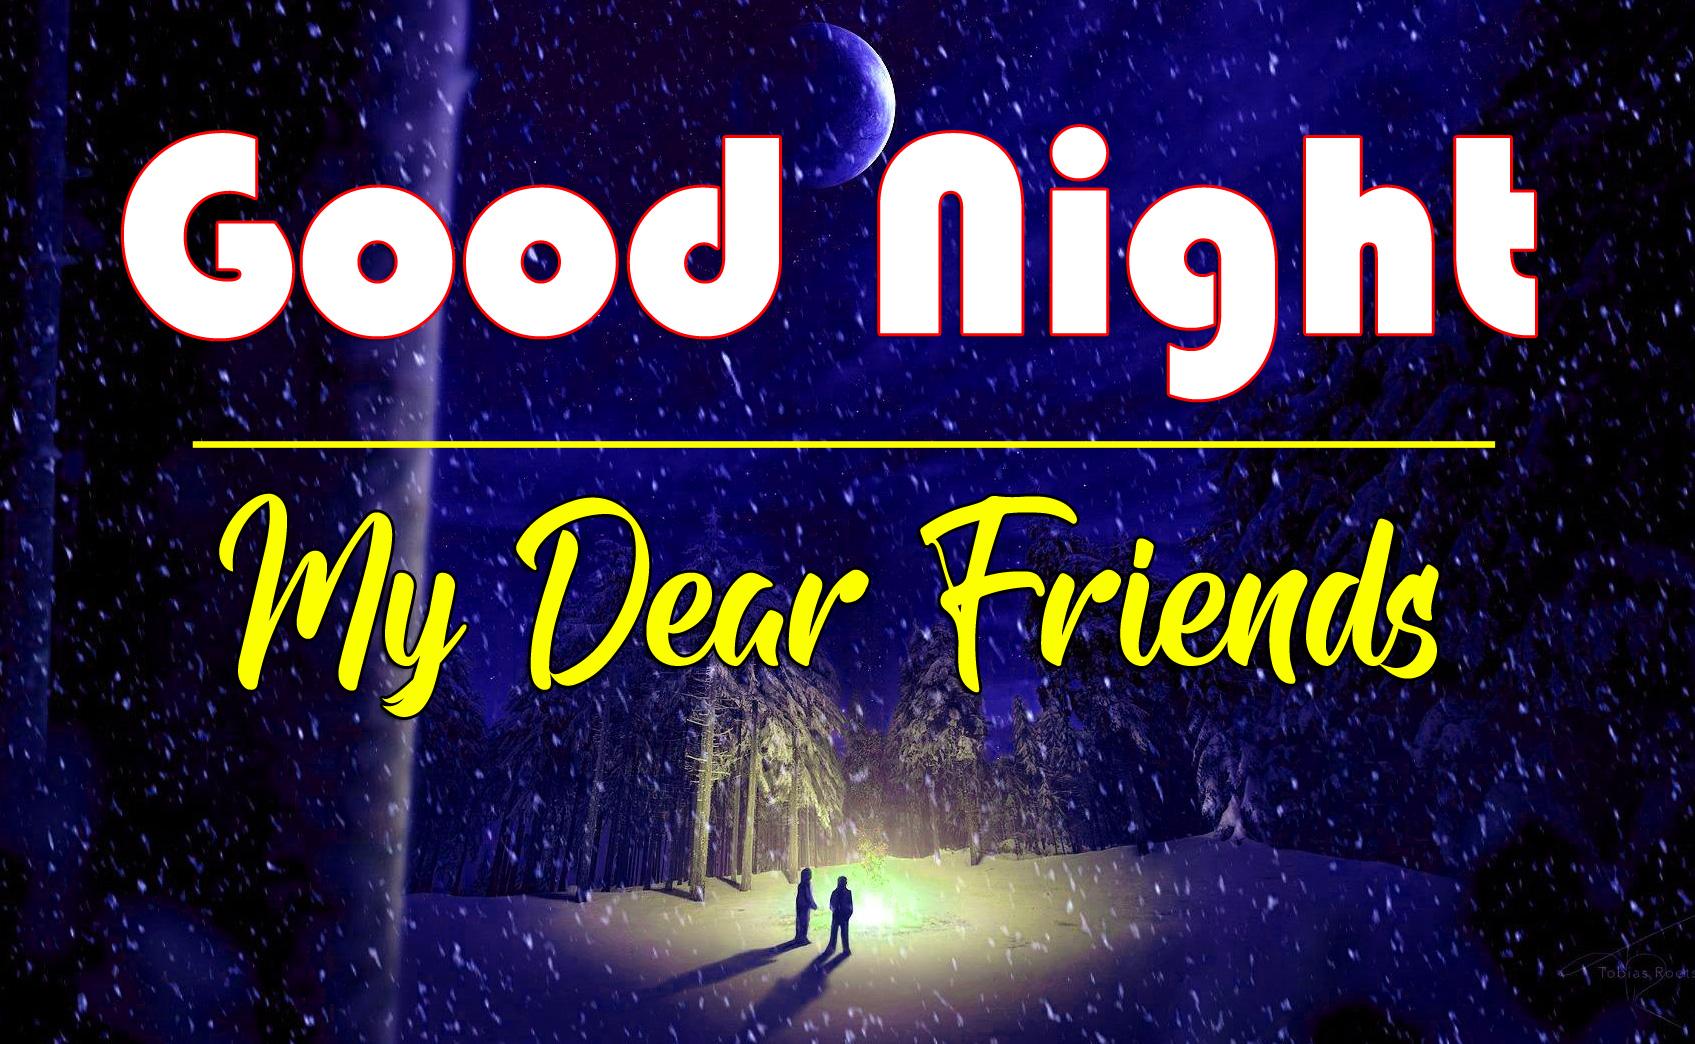 Free 4k Good Night Images Pics Download